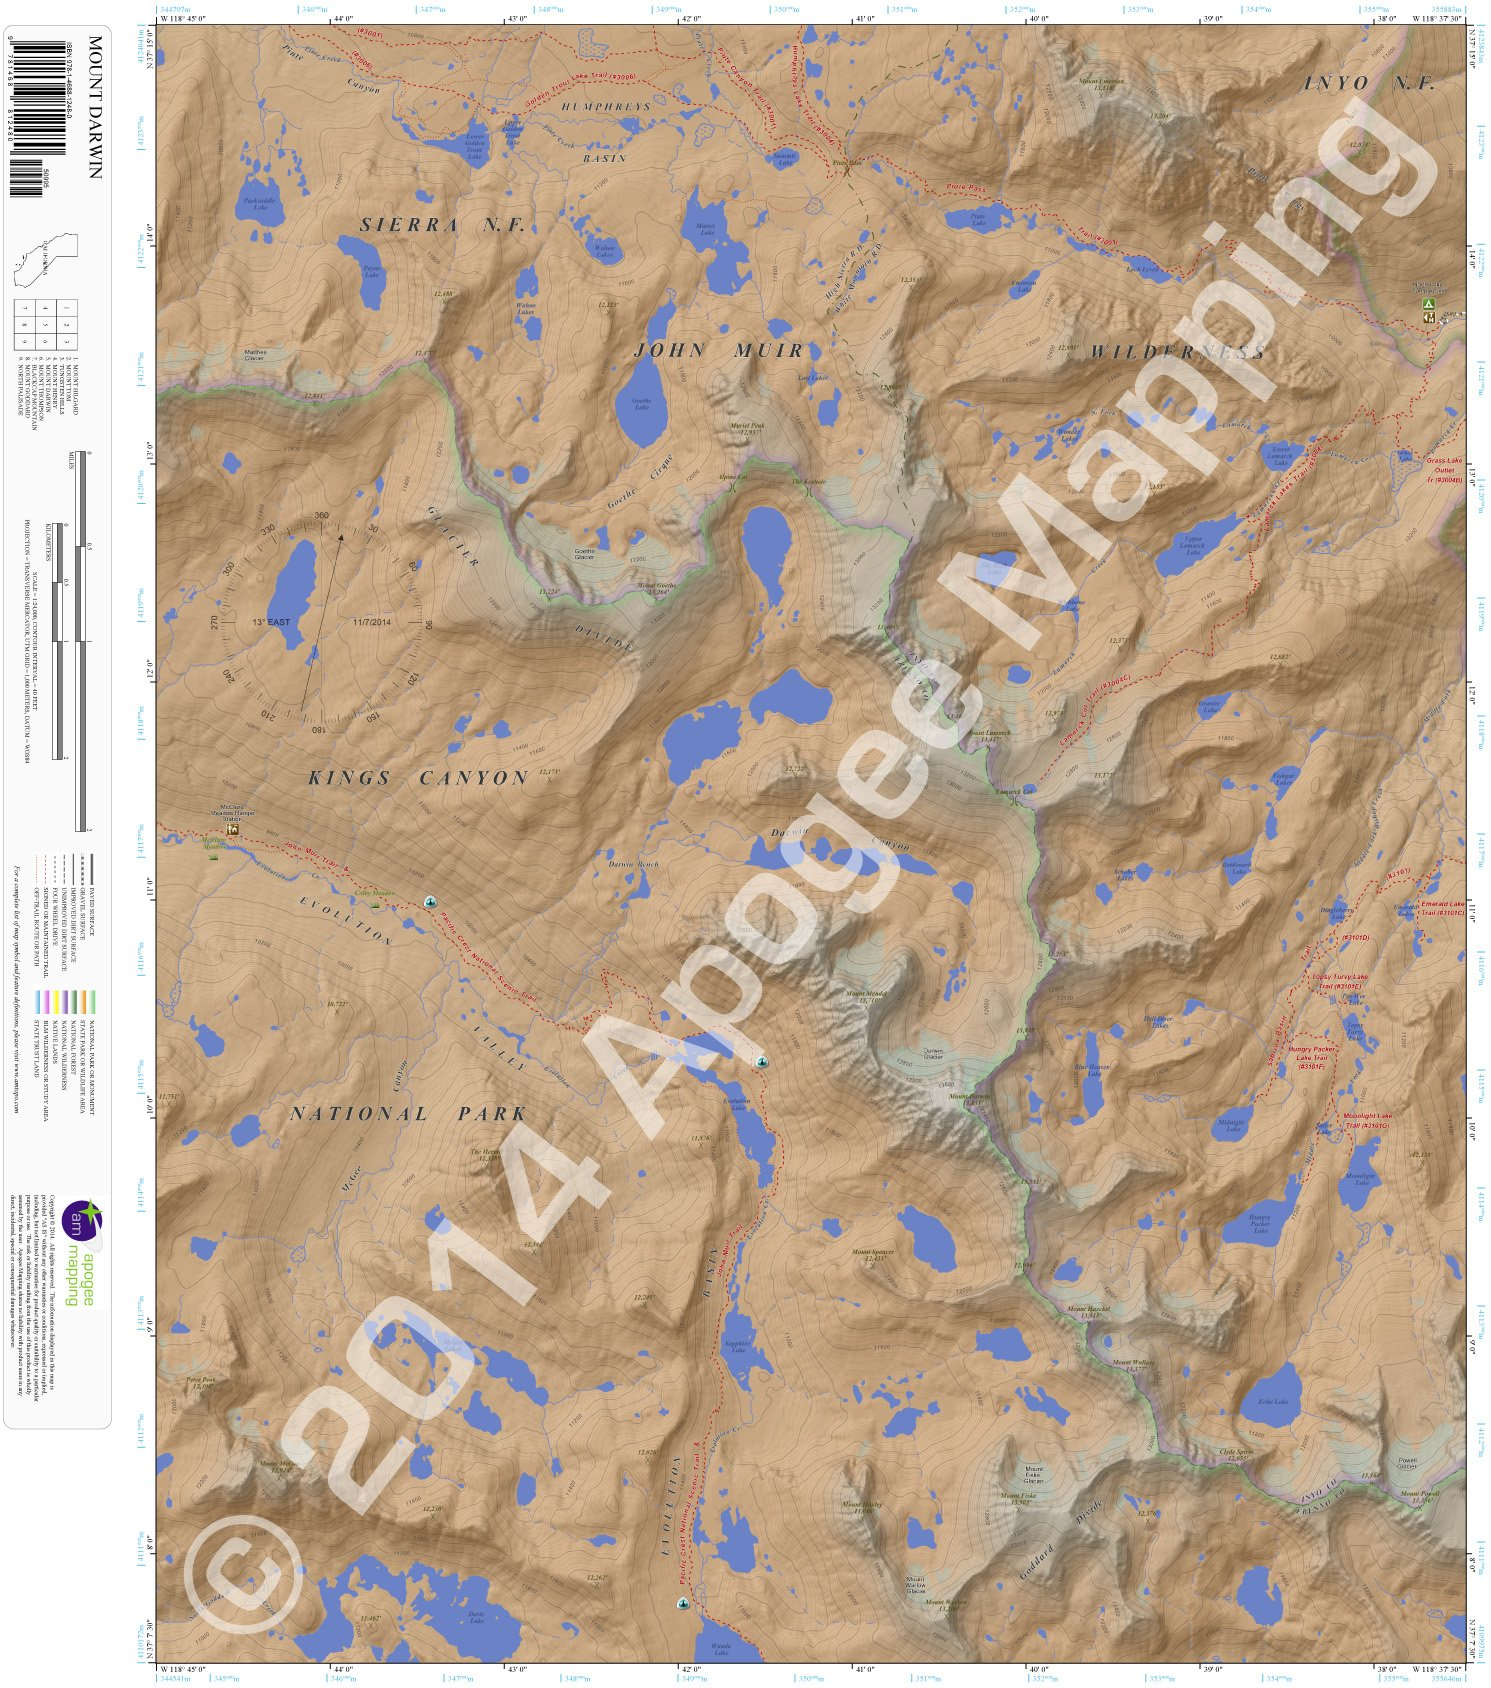 Darwin California Map.Mount Darwin California 7 5 Minute Topographic Map Waterproof